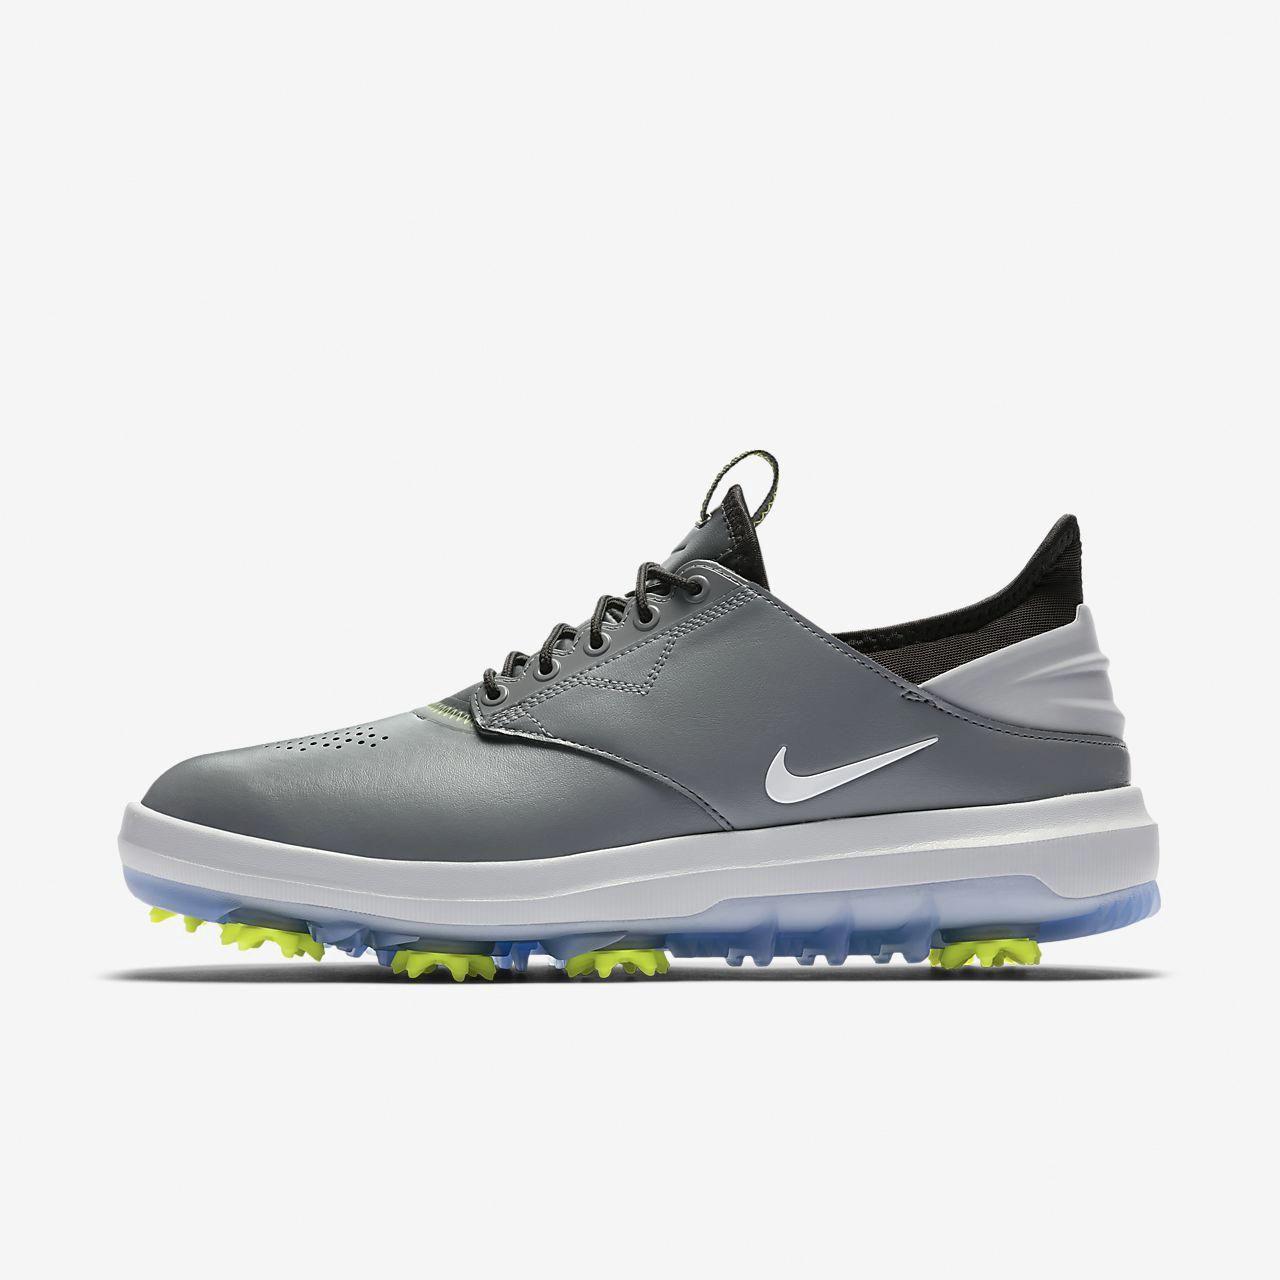 cc2ae8804cc8 Nike Air Zoom Direct Men s Golf Shoe - 10.5  mensgolfshoes